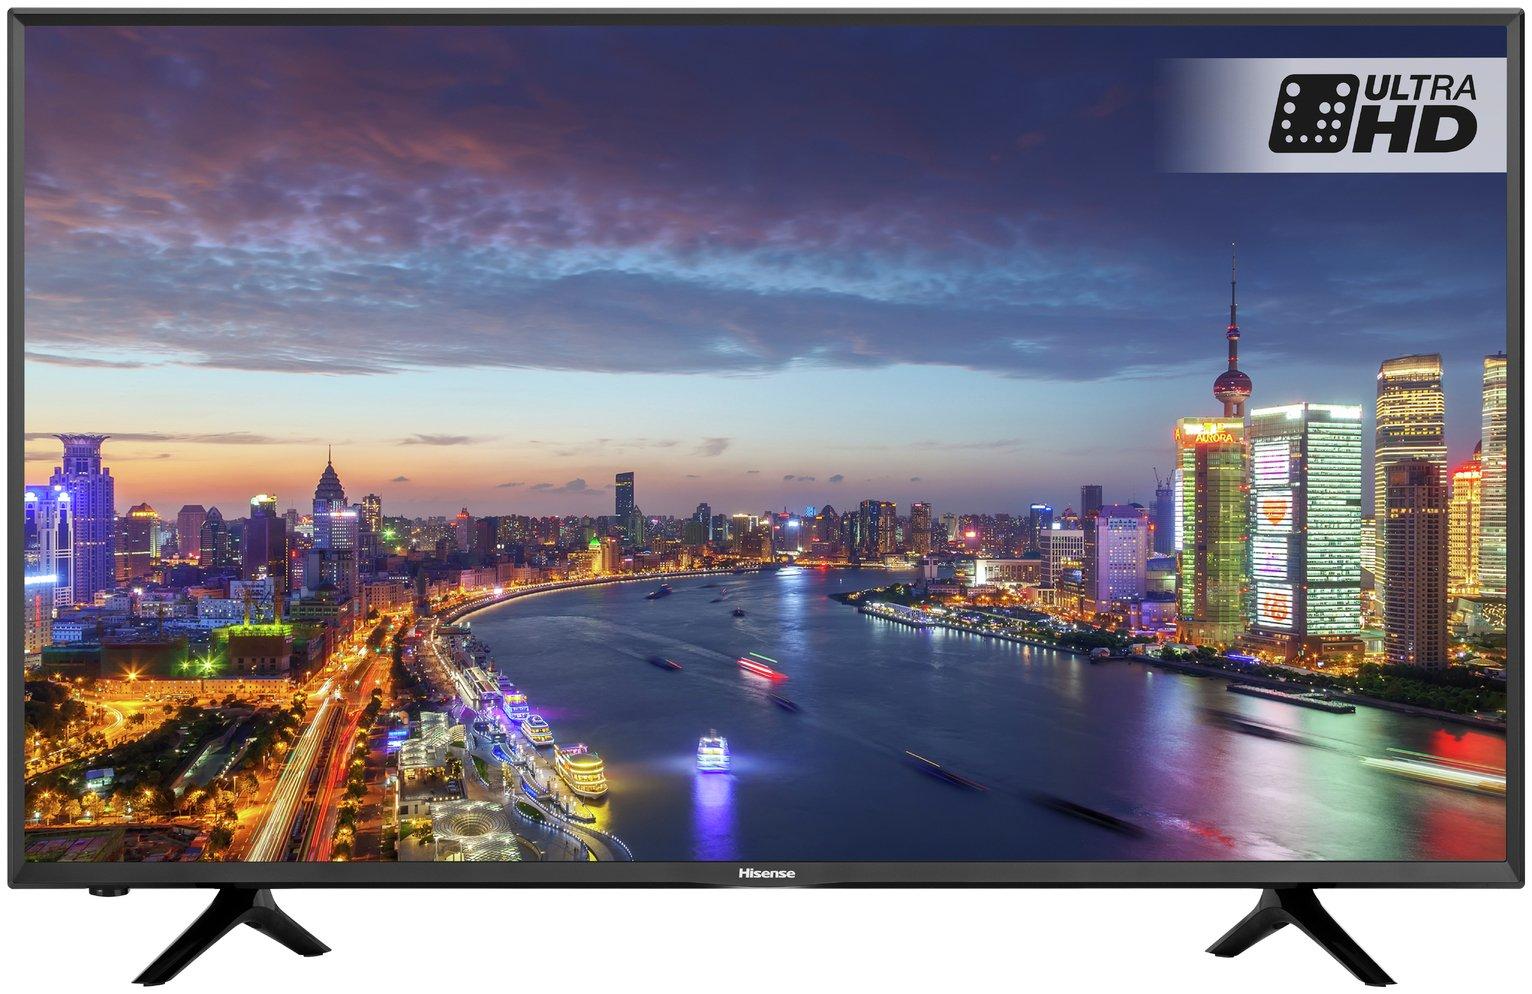 Hisense H55N5300 55 Inch 4K Ultra HD Smart TV (7286085